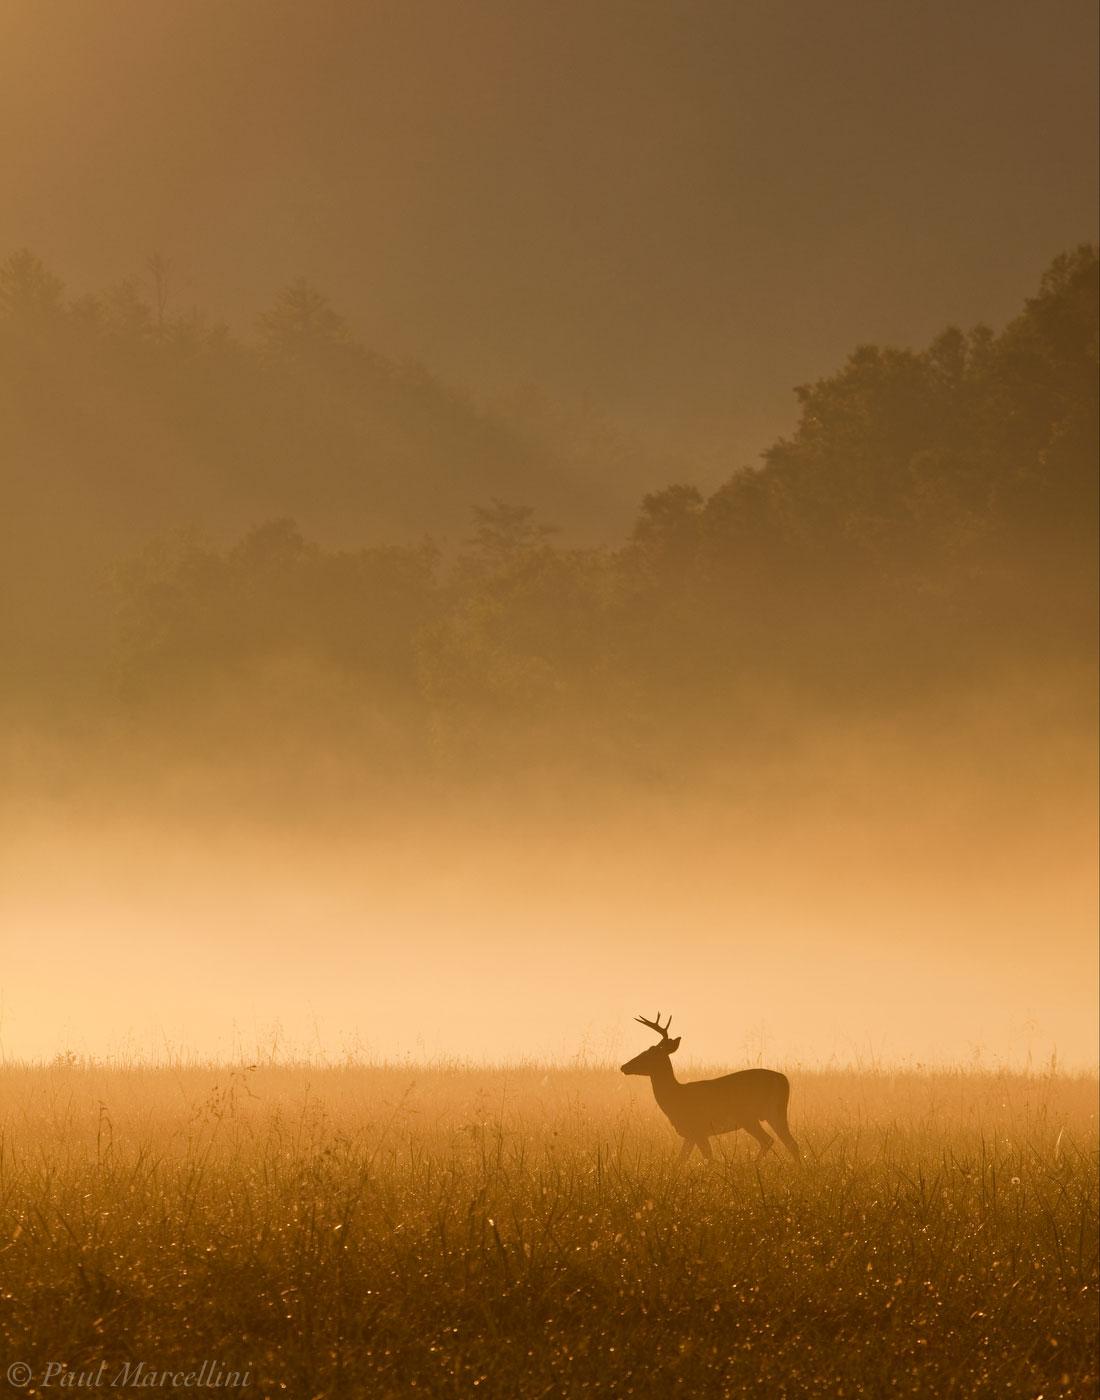 Odocoileus virginianus, white-tailed deer, great smoky mountains, cades cove, foggy, deer, photo